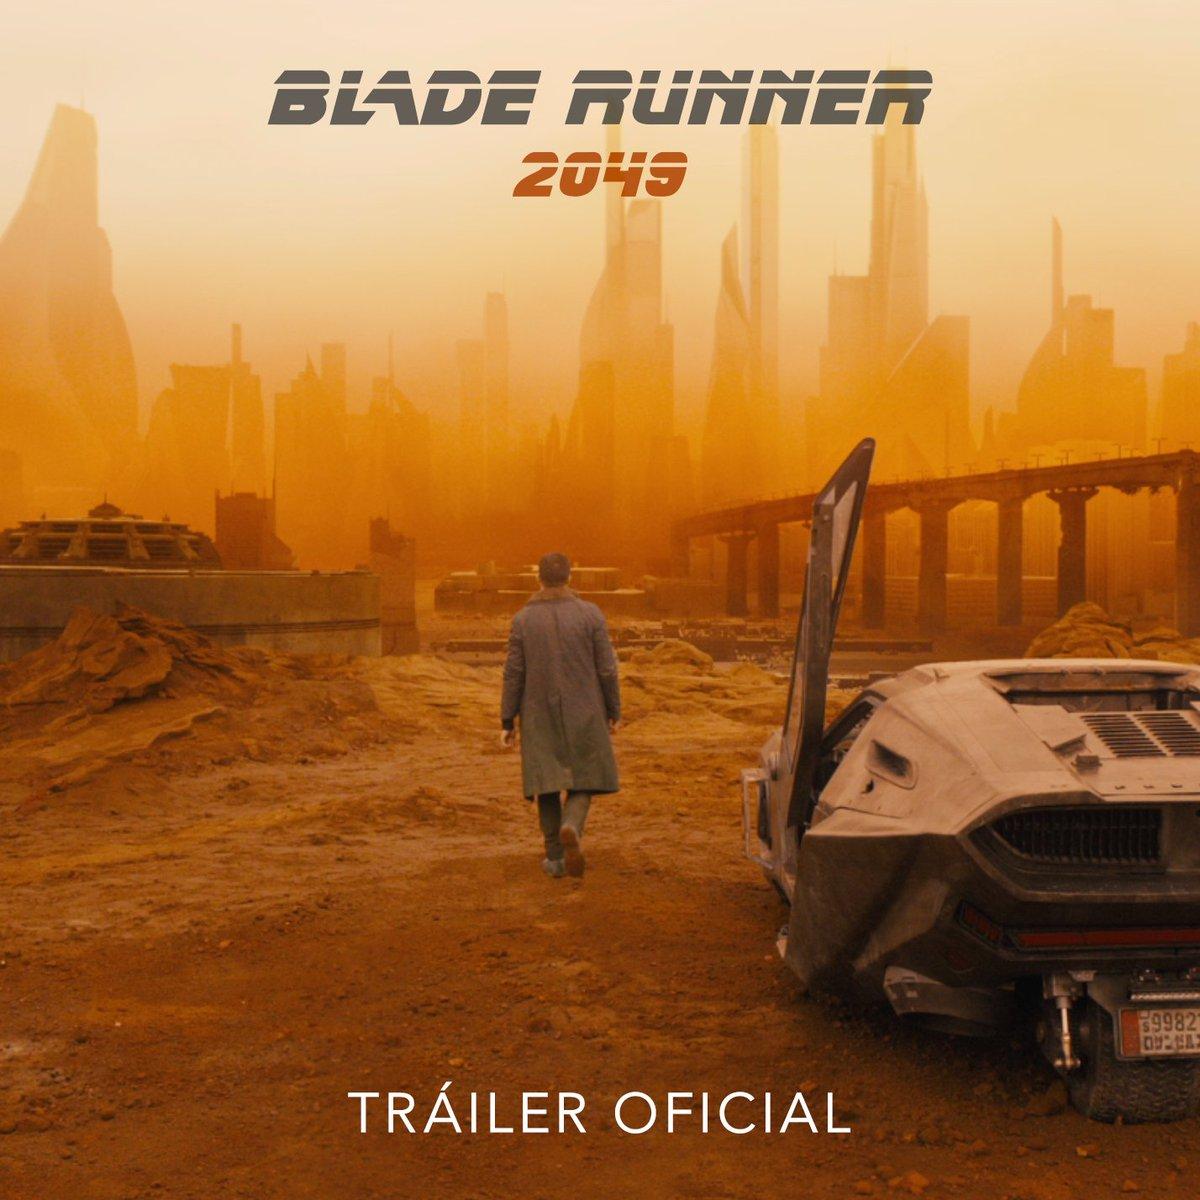 Todavía quedan páginas en esta historia. #BladeRunnerLaPelícula #BladeRunner2049 https://t.co/eIWpPoQZv0